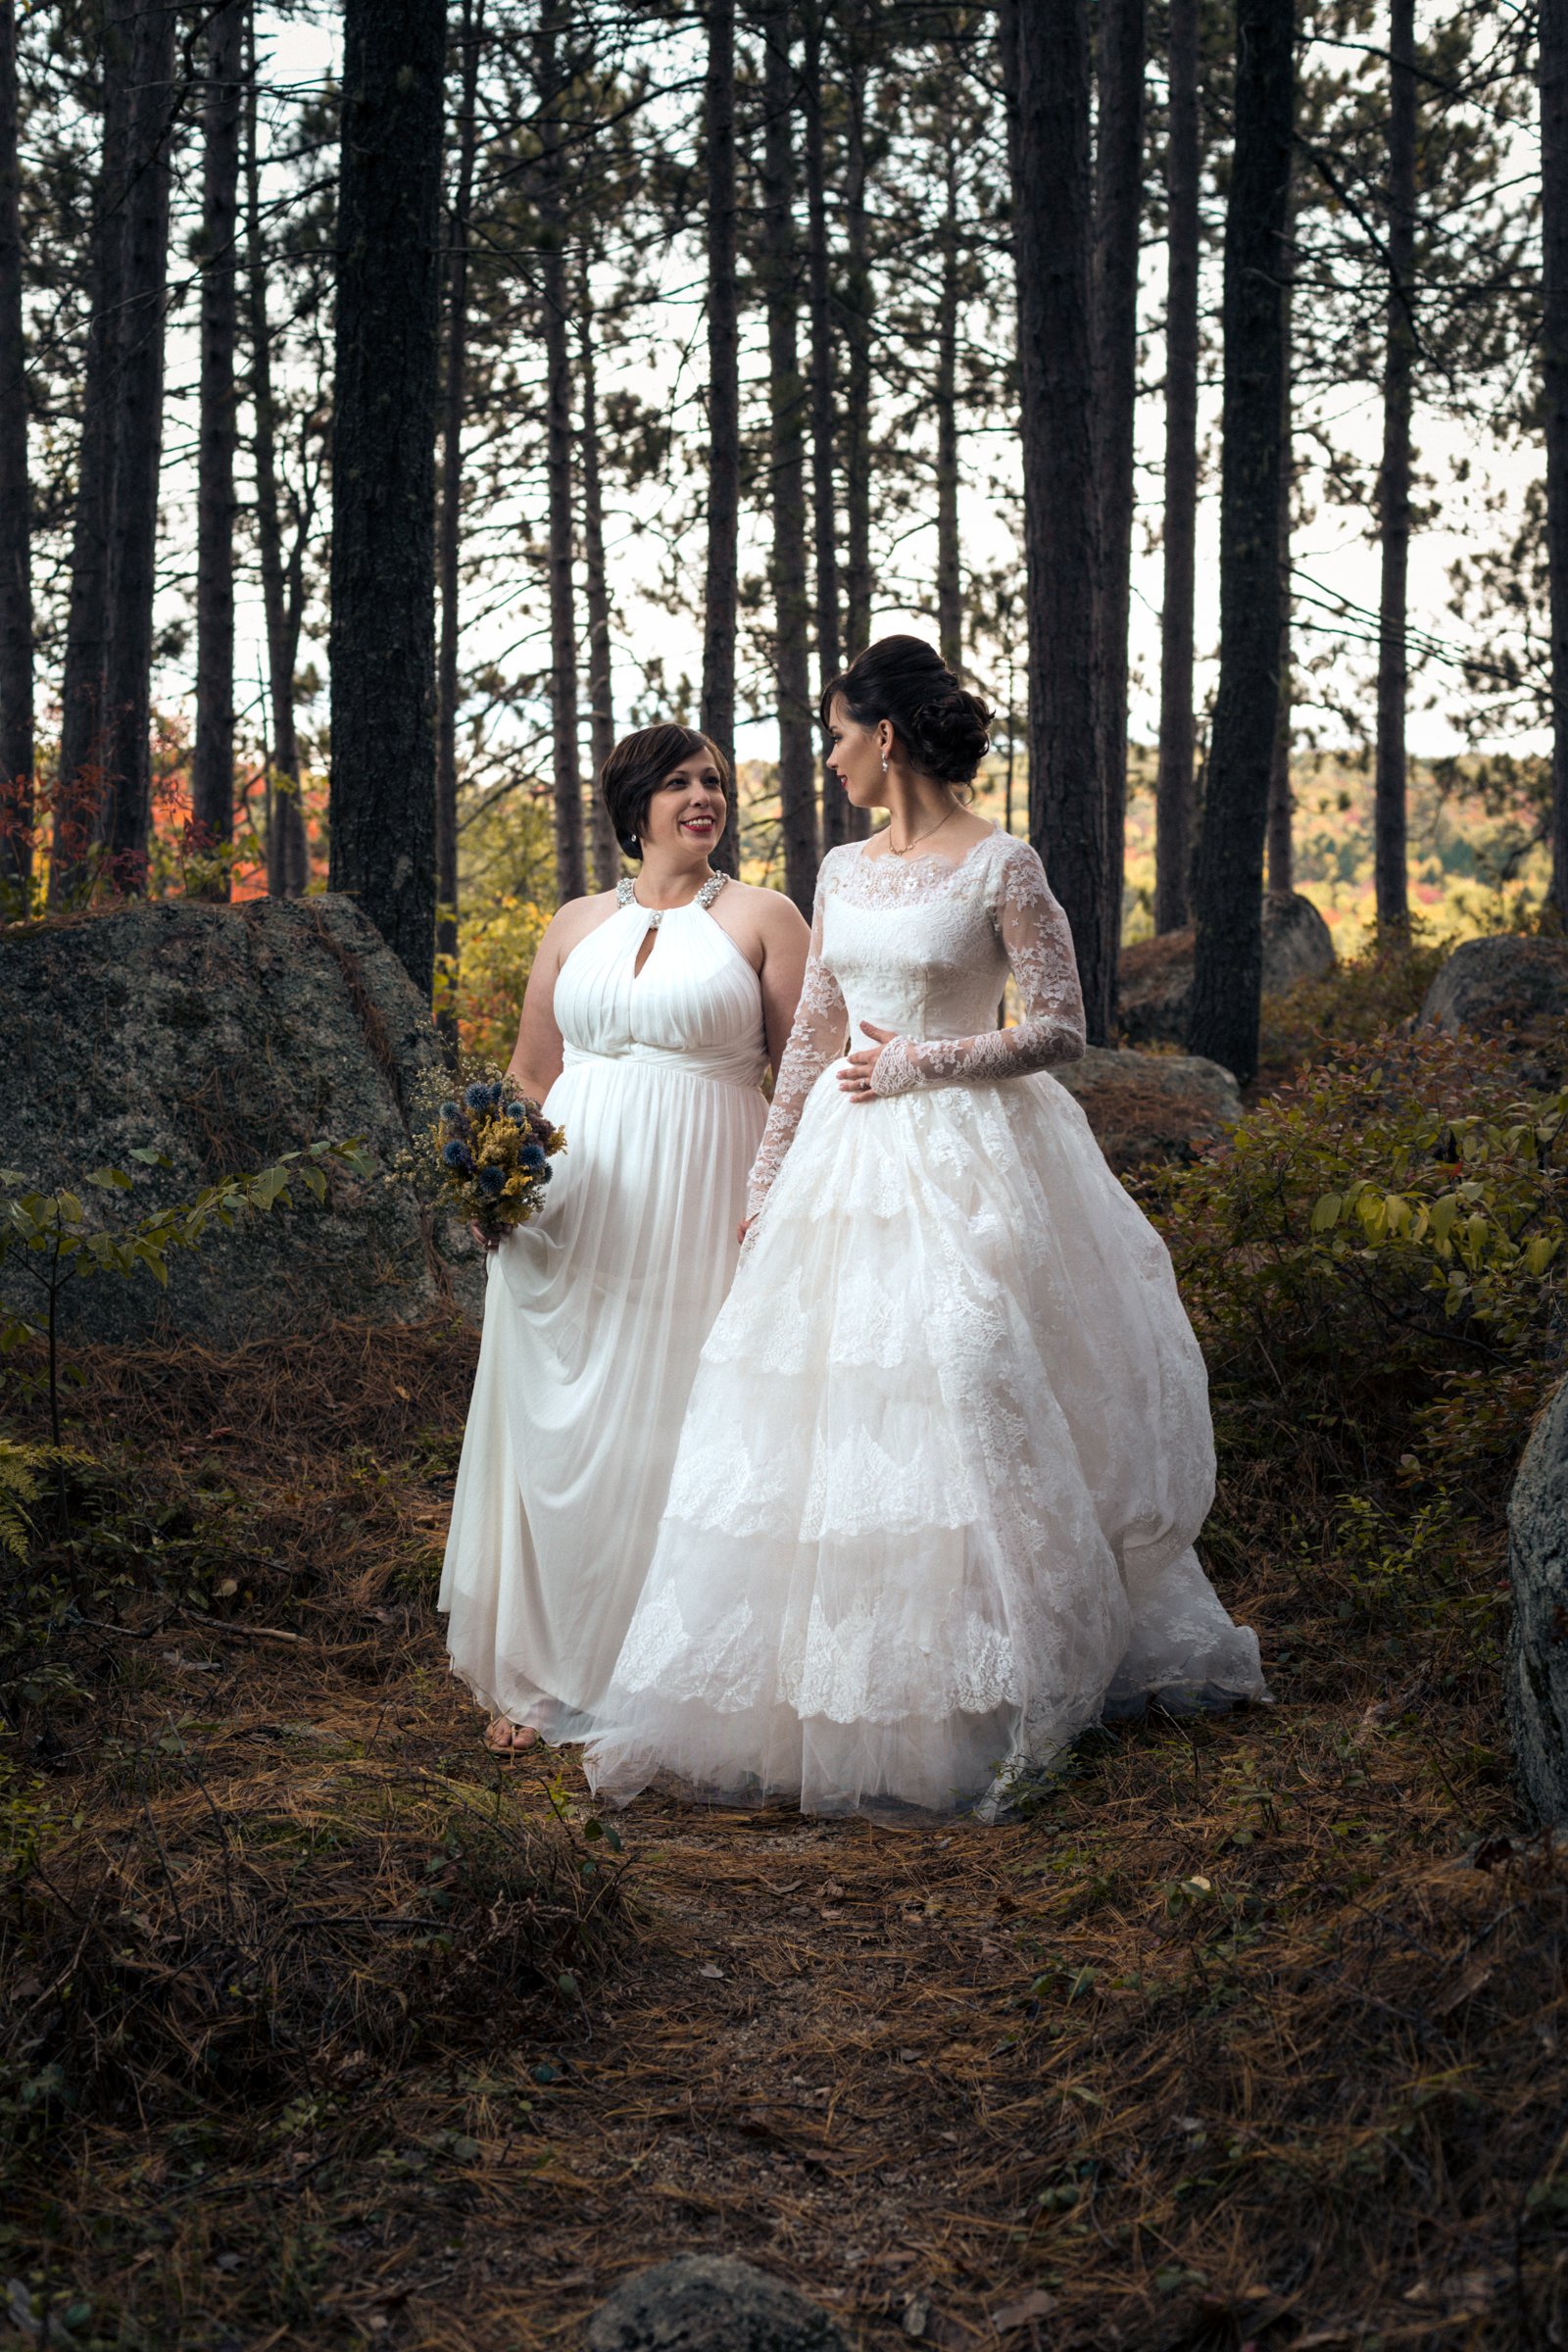 201610_k&c_wedding_2136.jpg